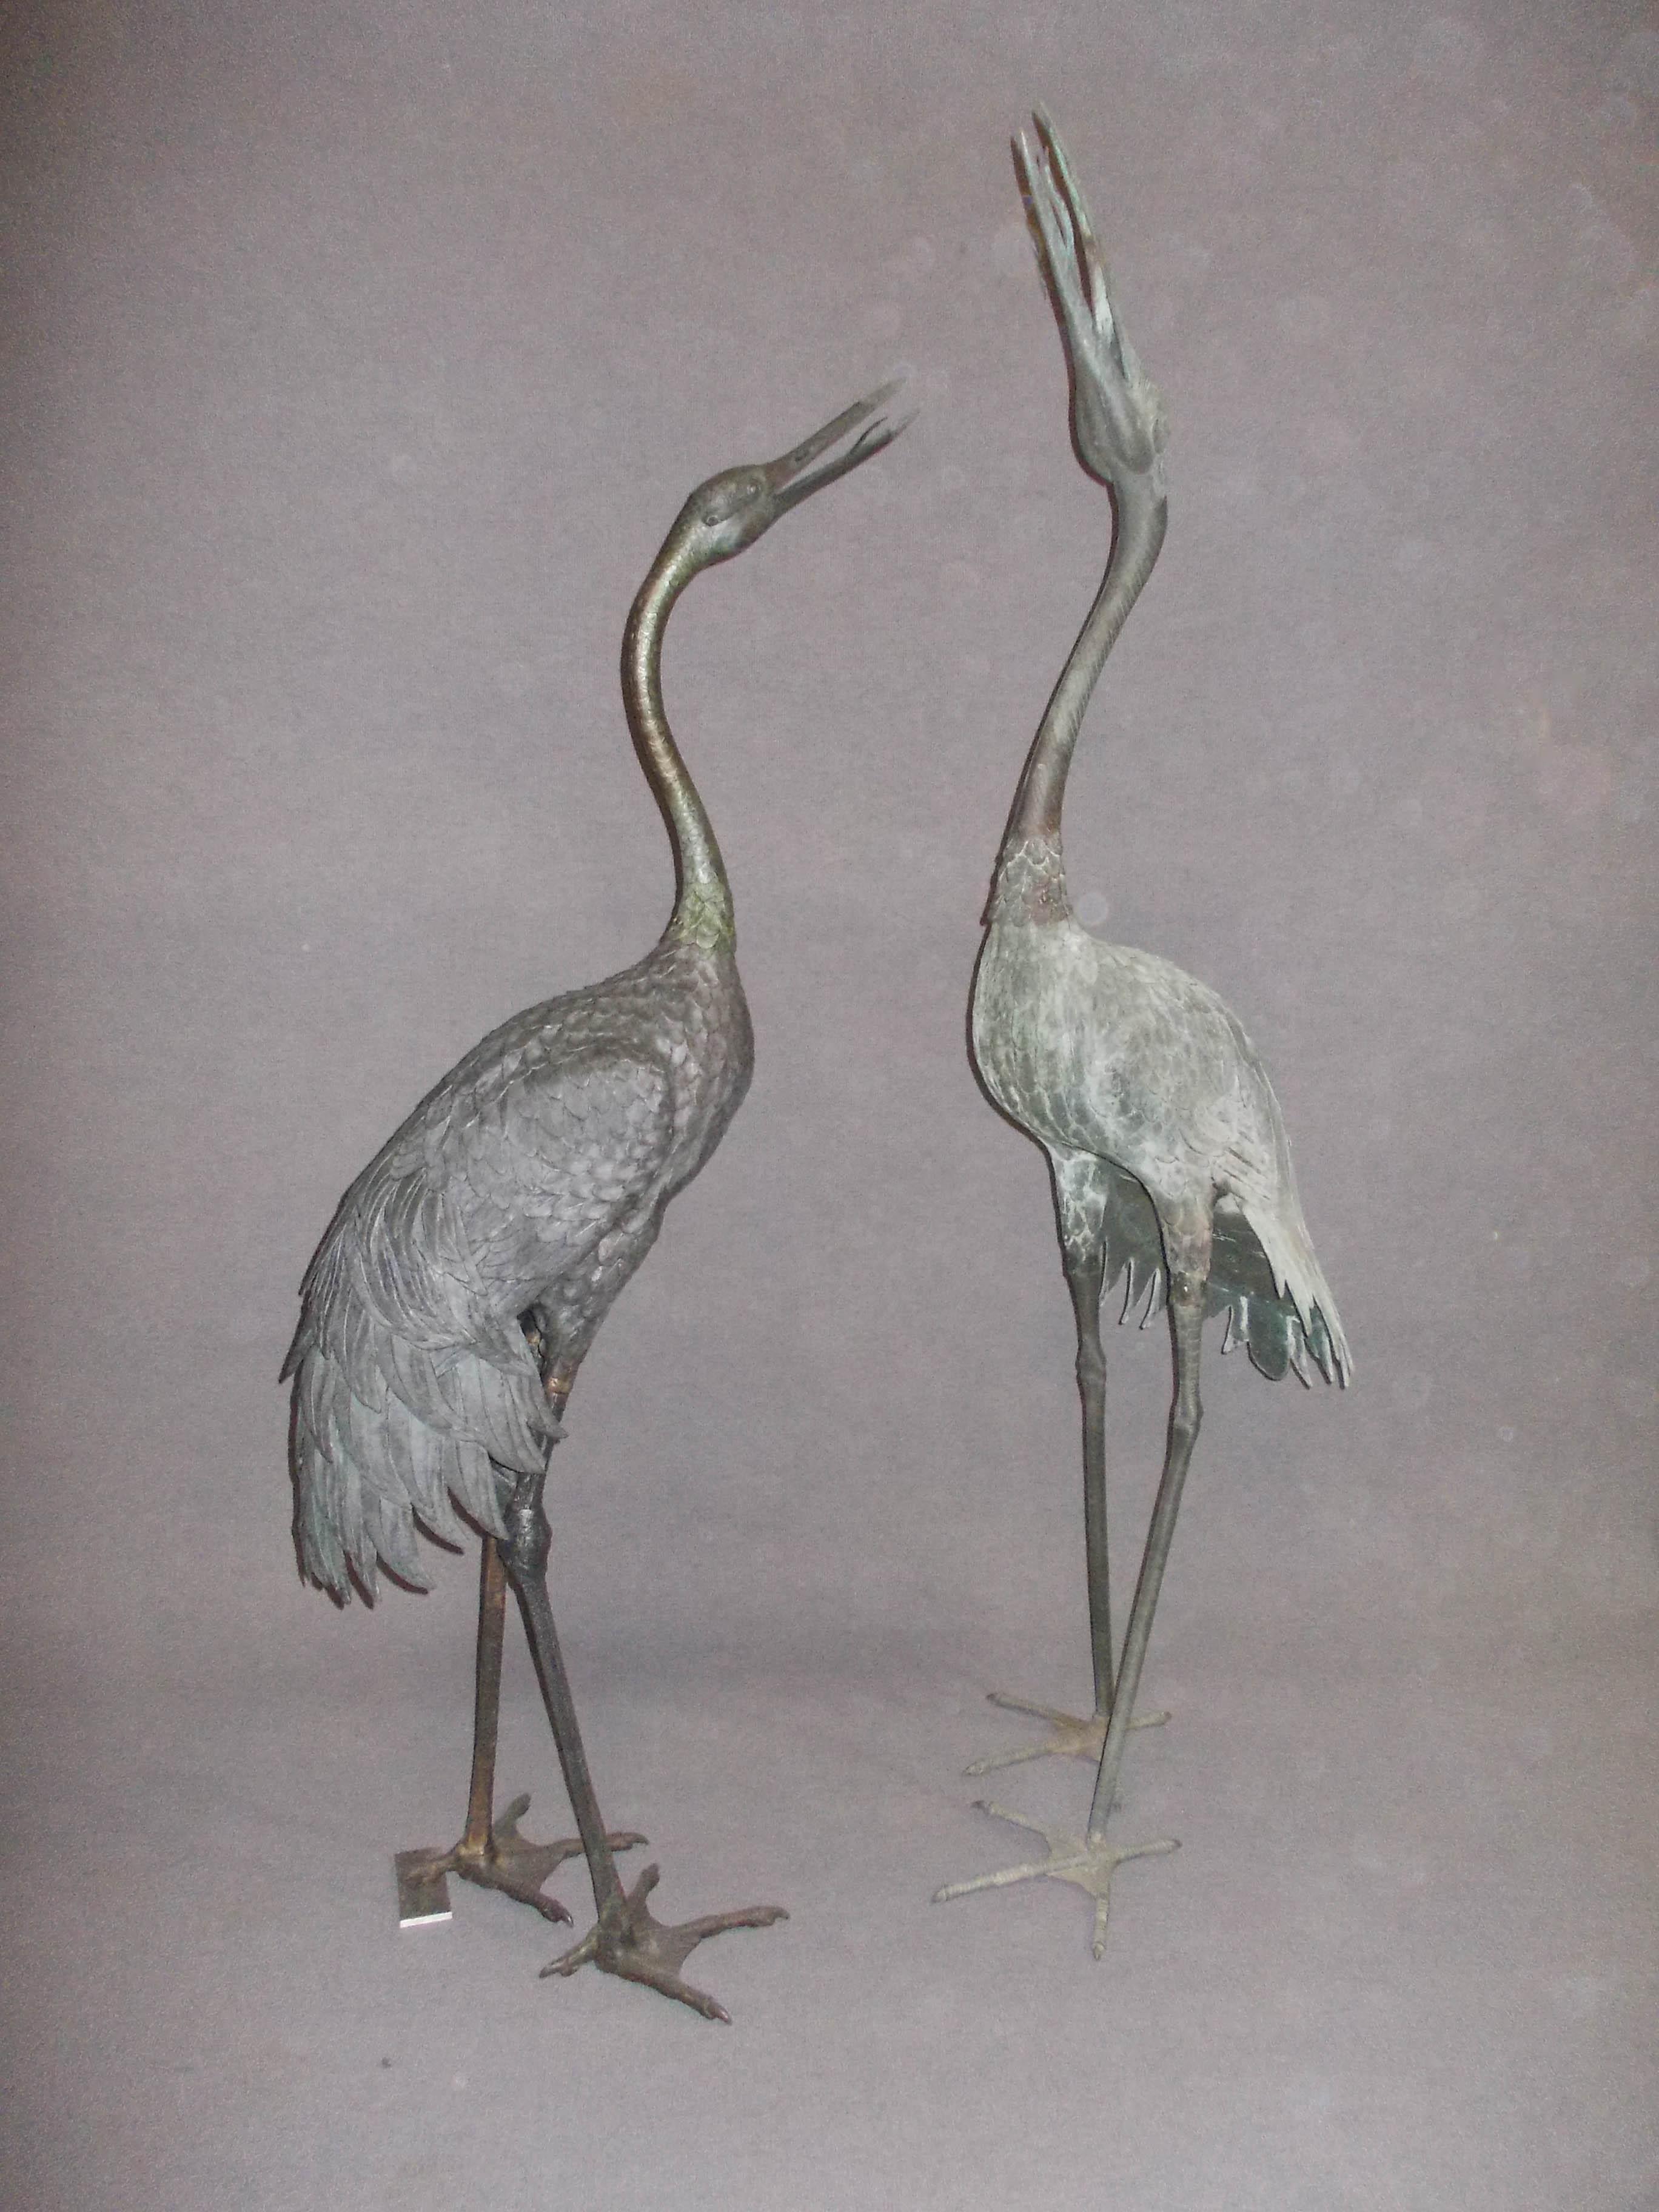 Heron garden ornament - Click To Enlarge